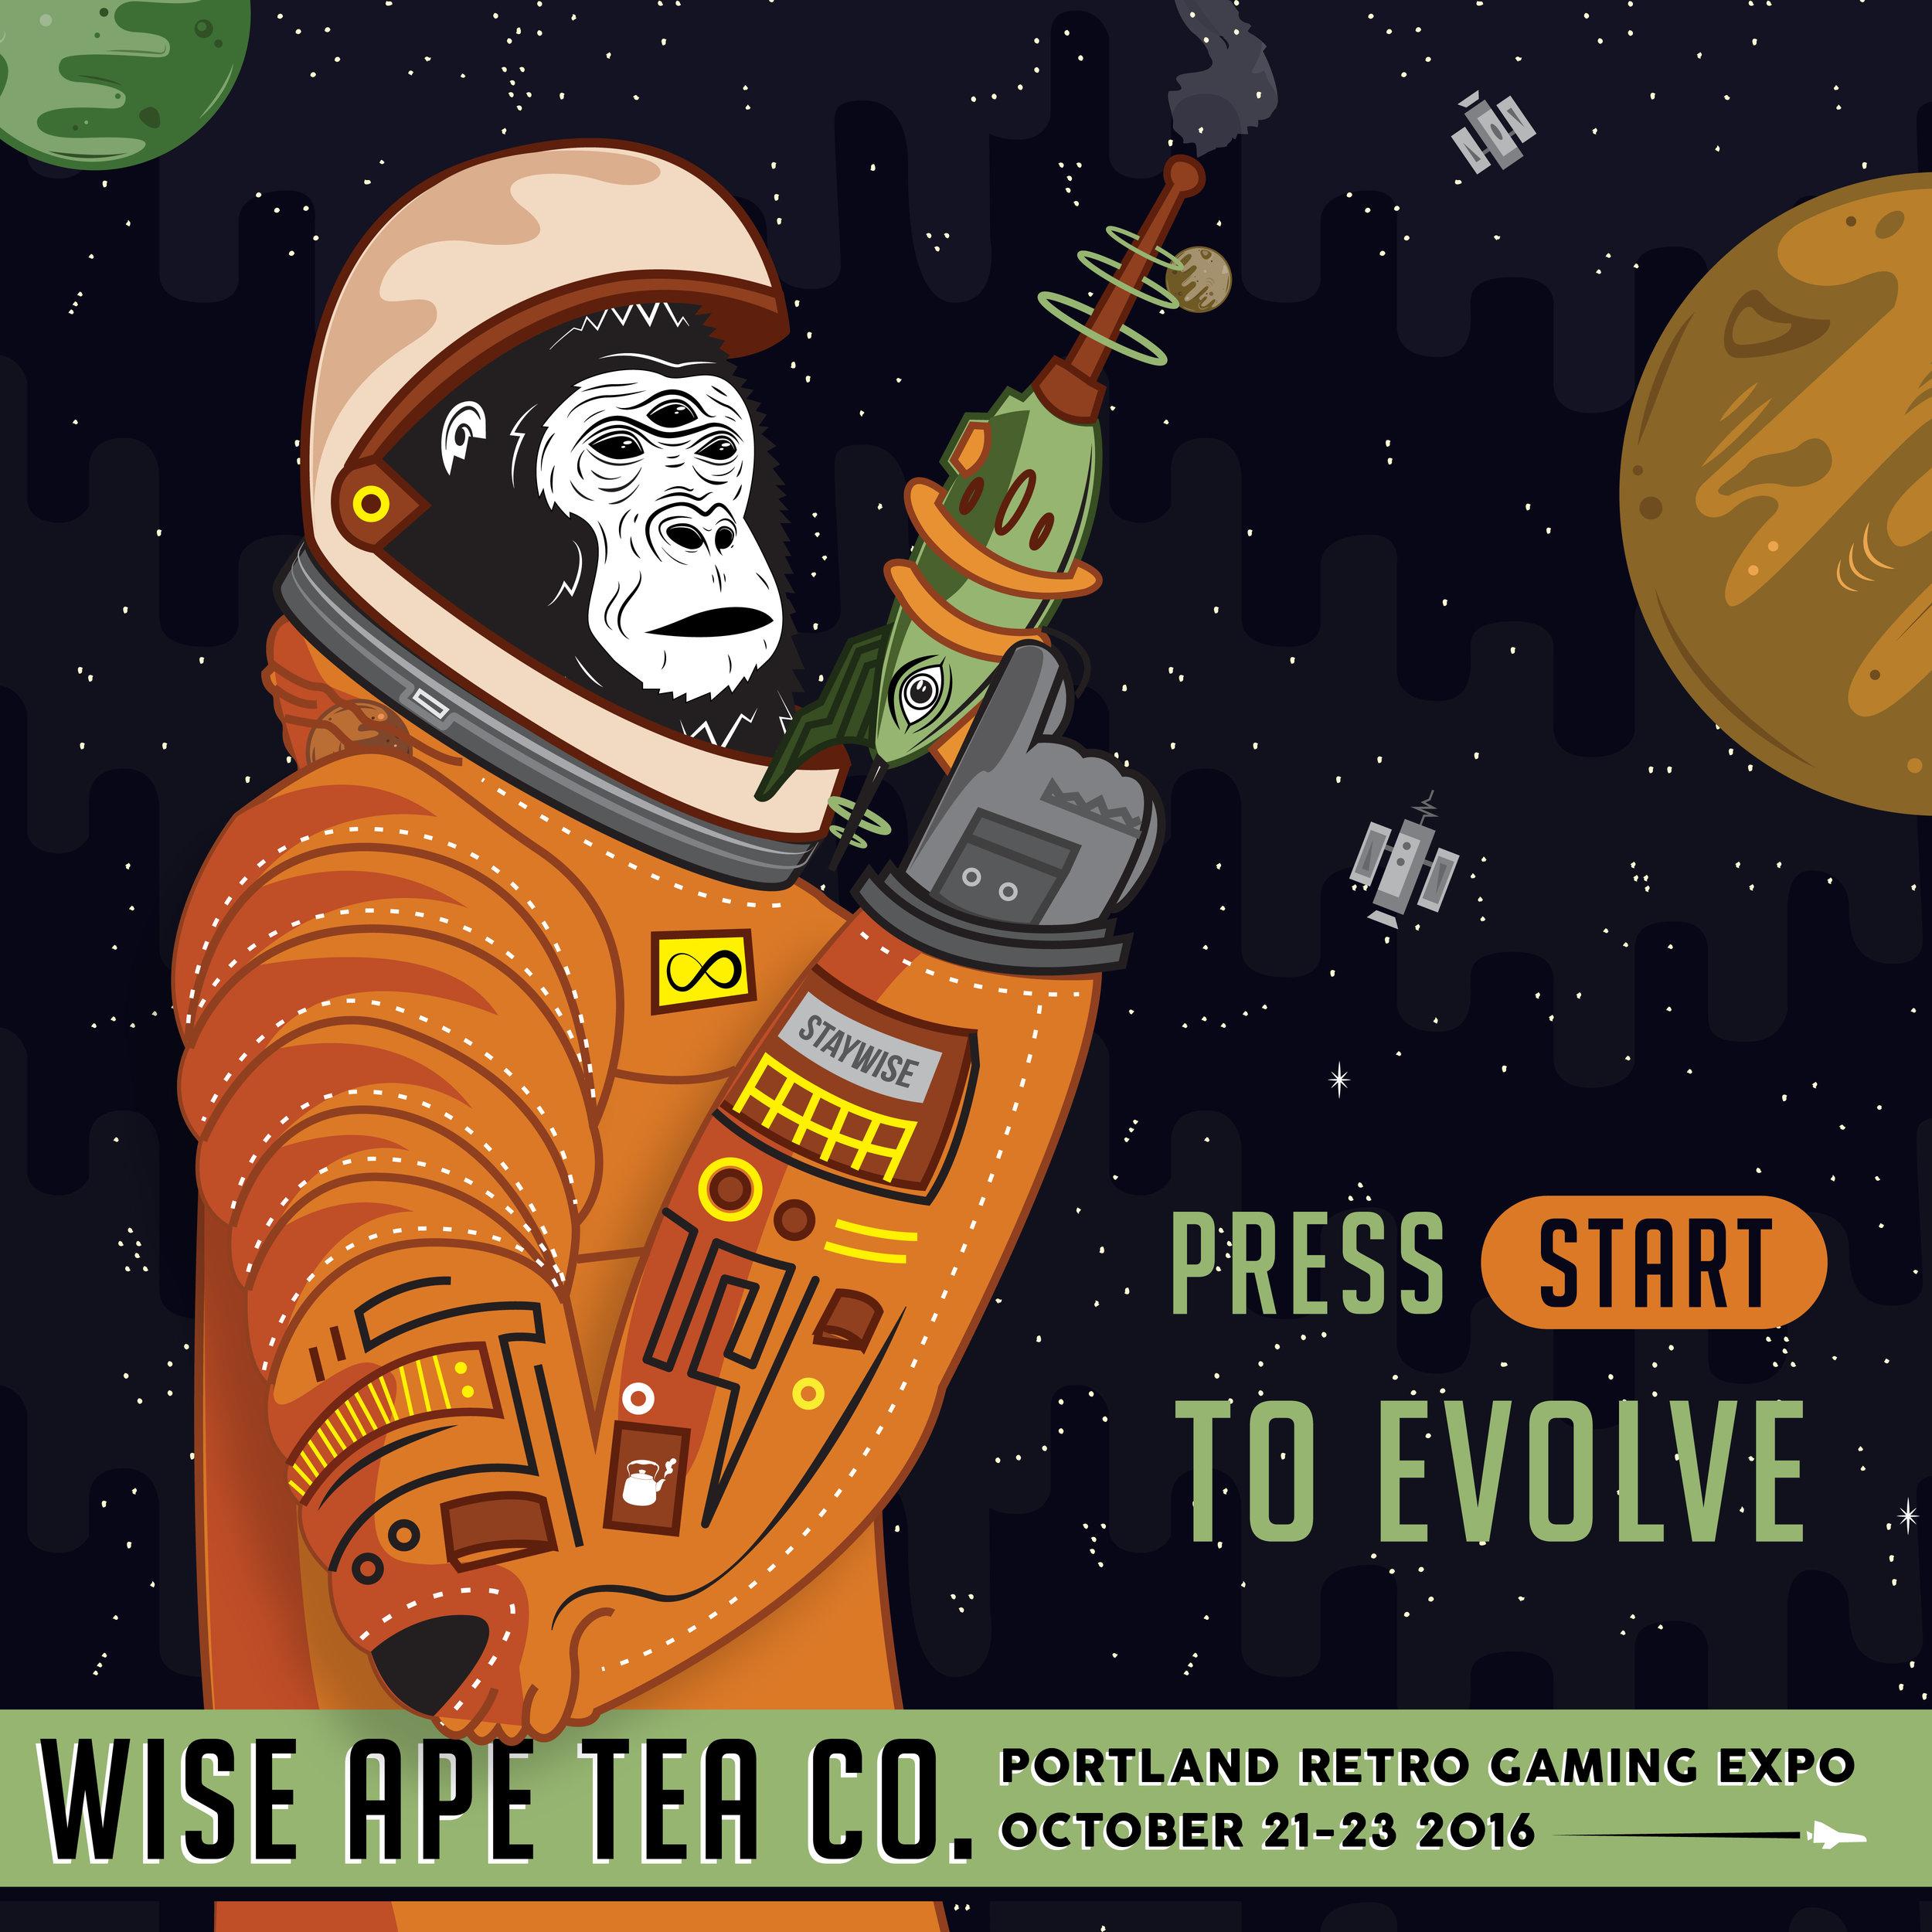 10-10 space ape square post-05.jpg